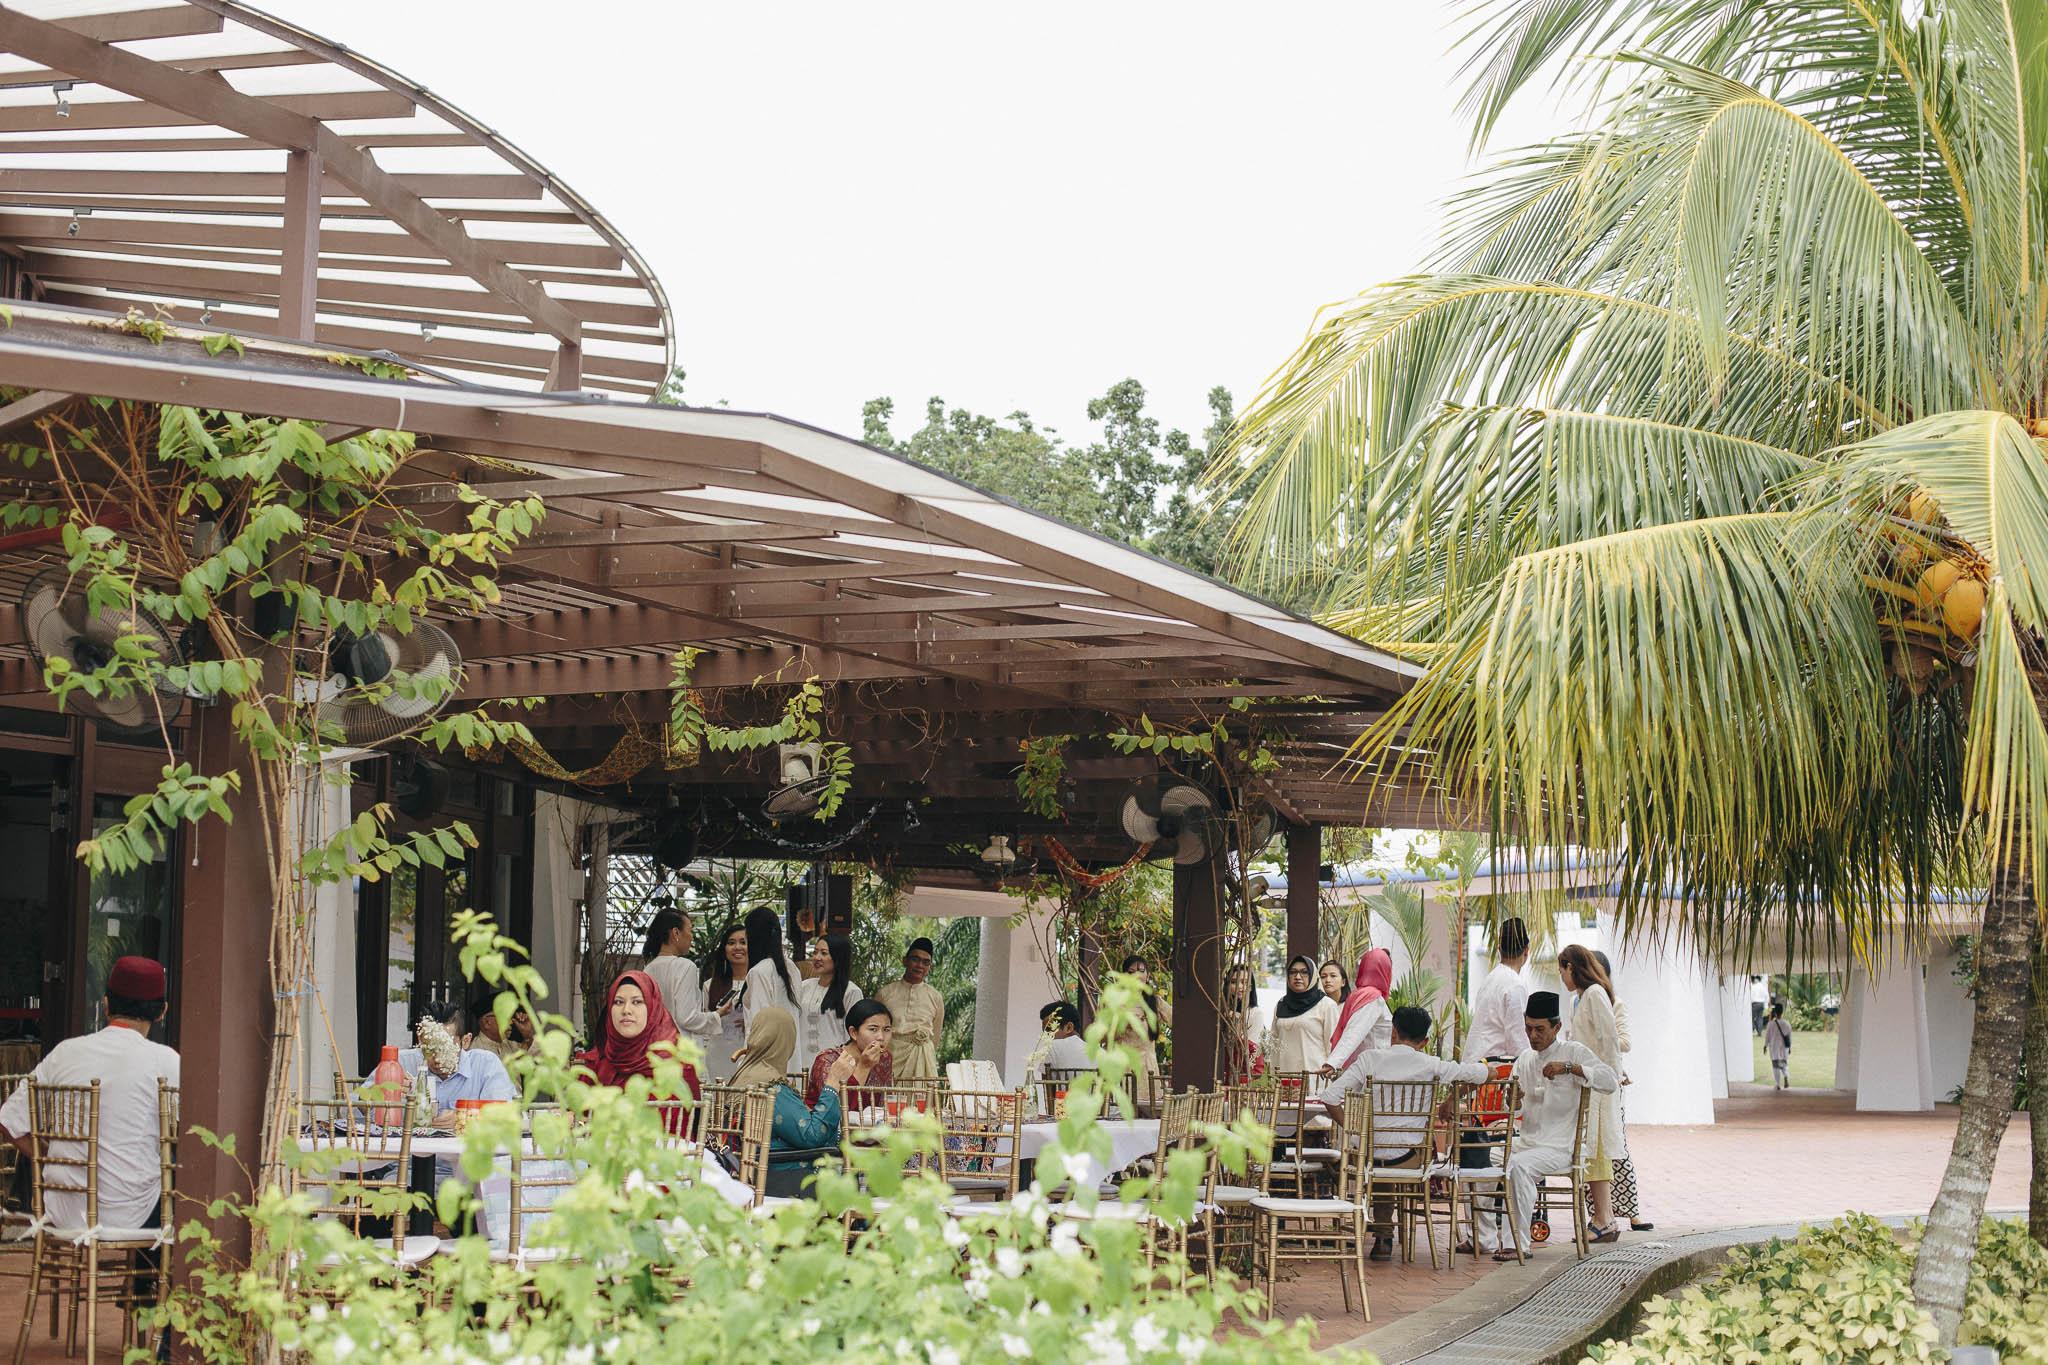 singapore-wedding-photographer-travel-khairul-atikah-36.jpg